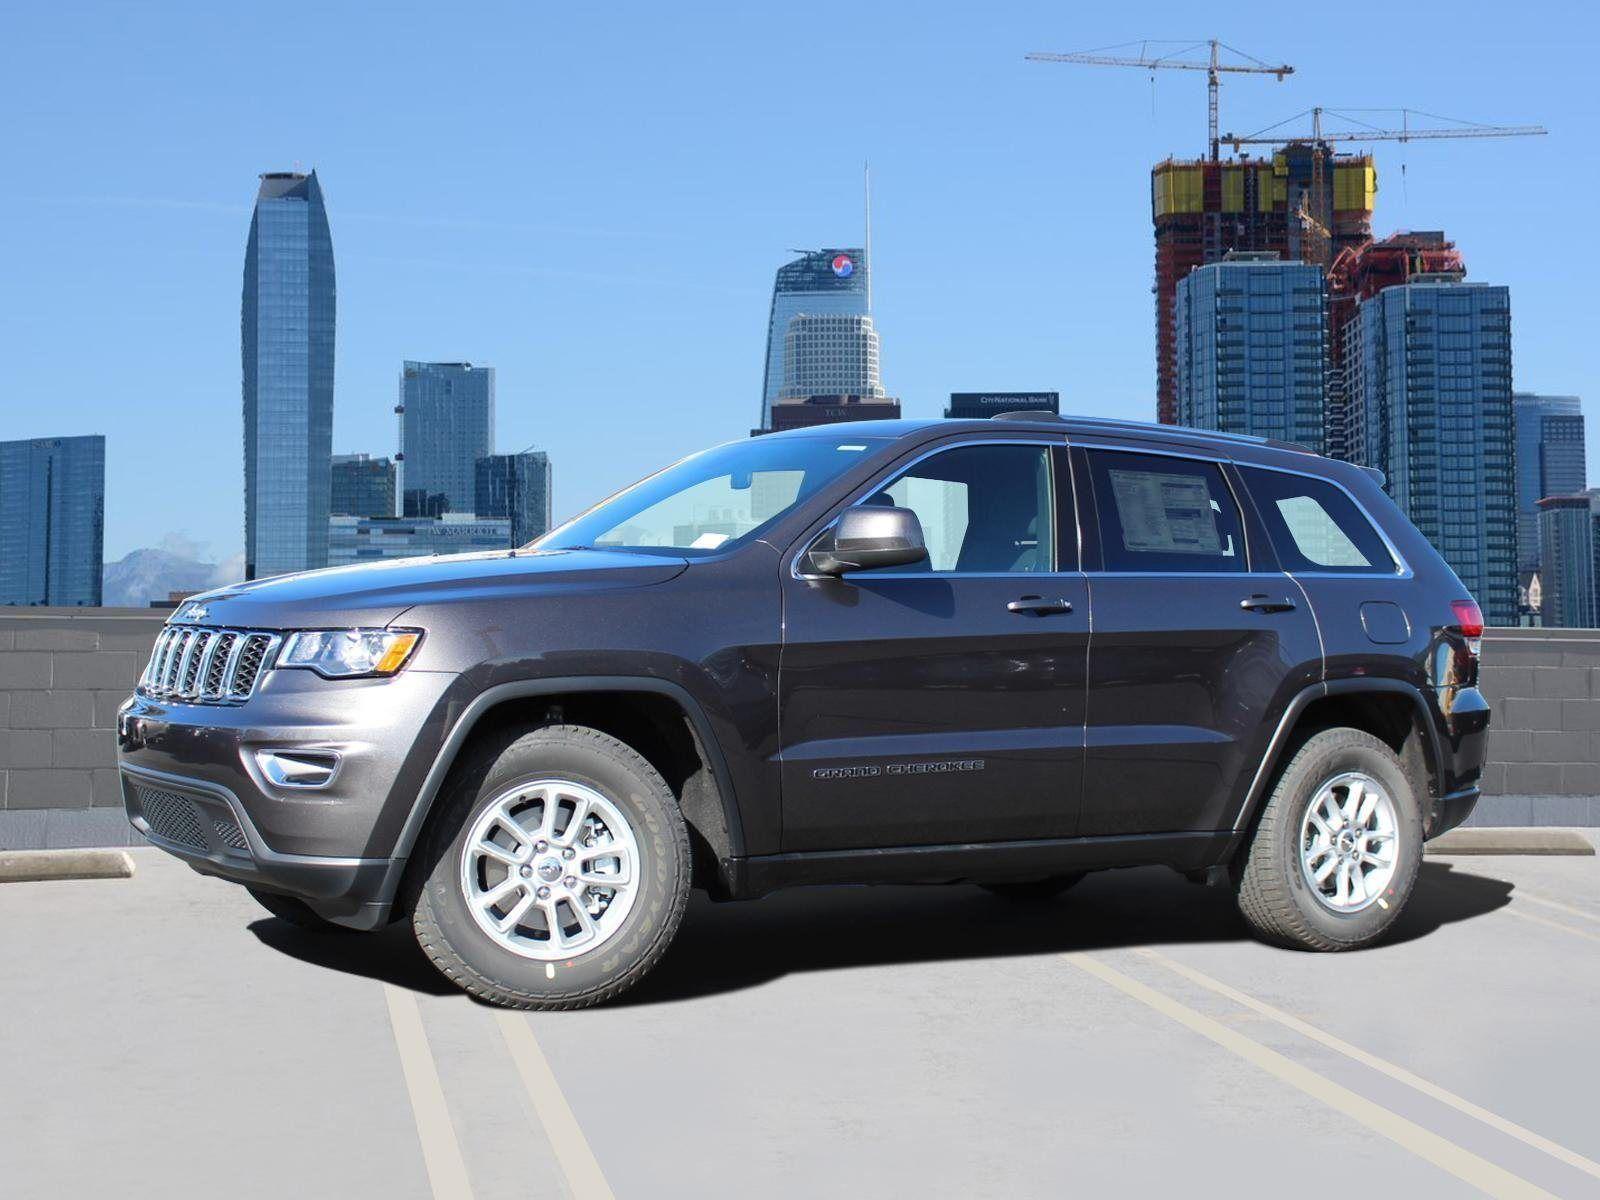 2020 Jeep Grand Cherokee Diesel Configurations In 2020 Jeep Grand Cherokee Diesel Jeep Grand Jeep Grand Cherokee